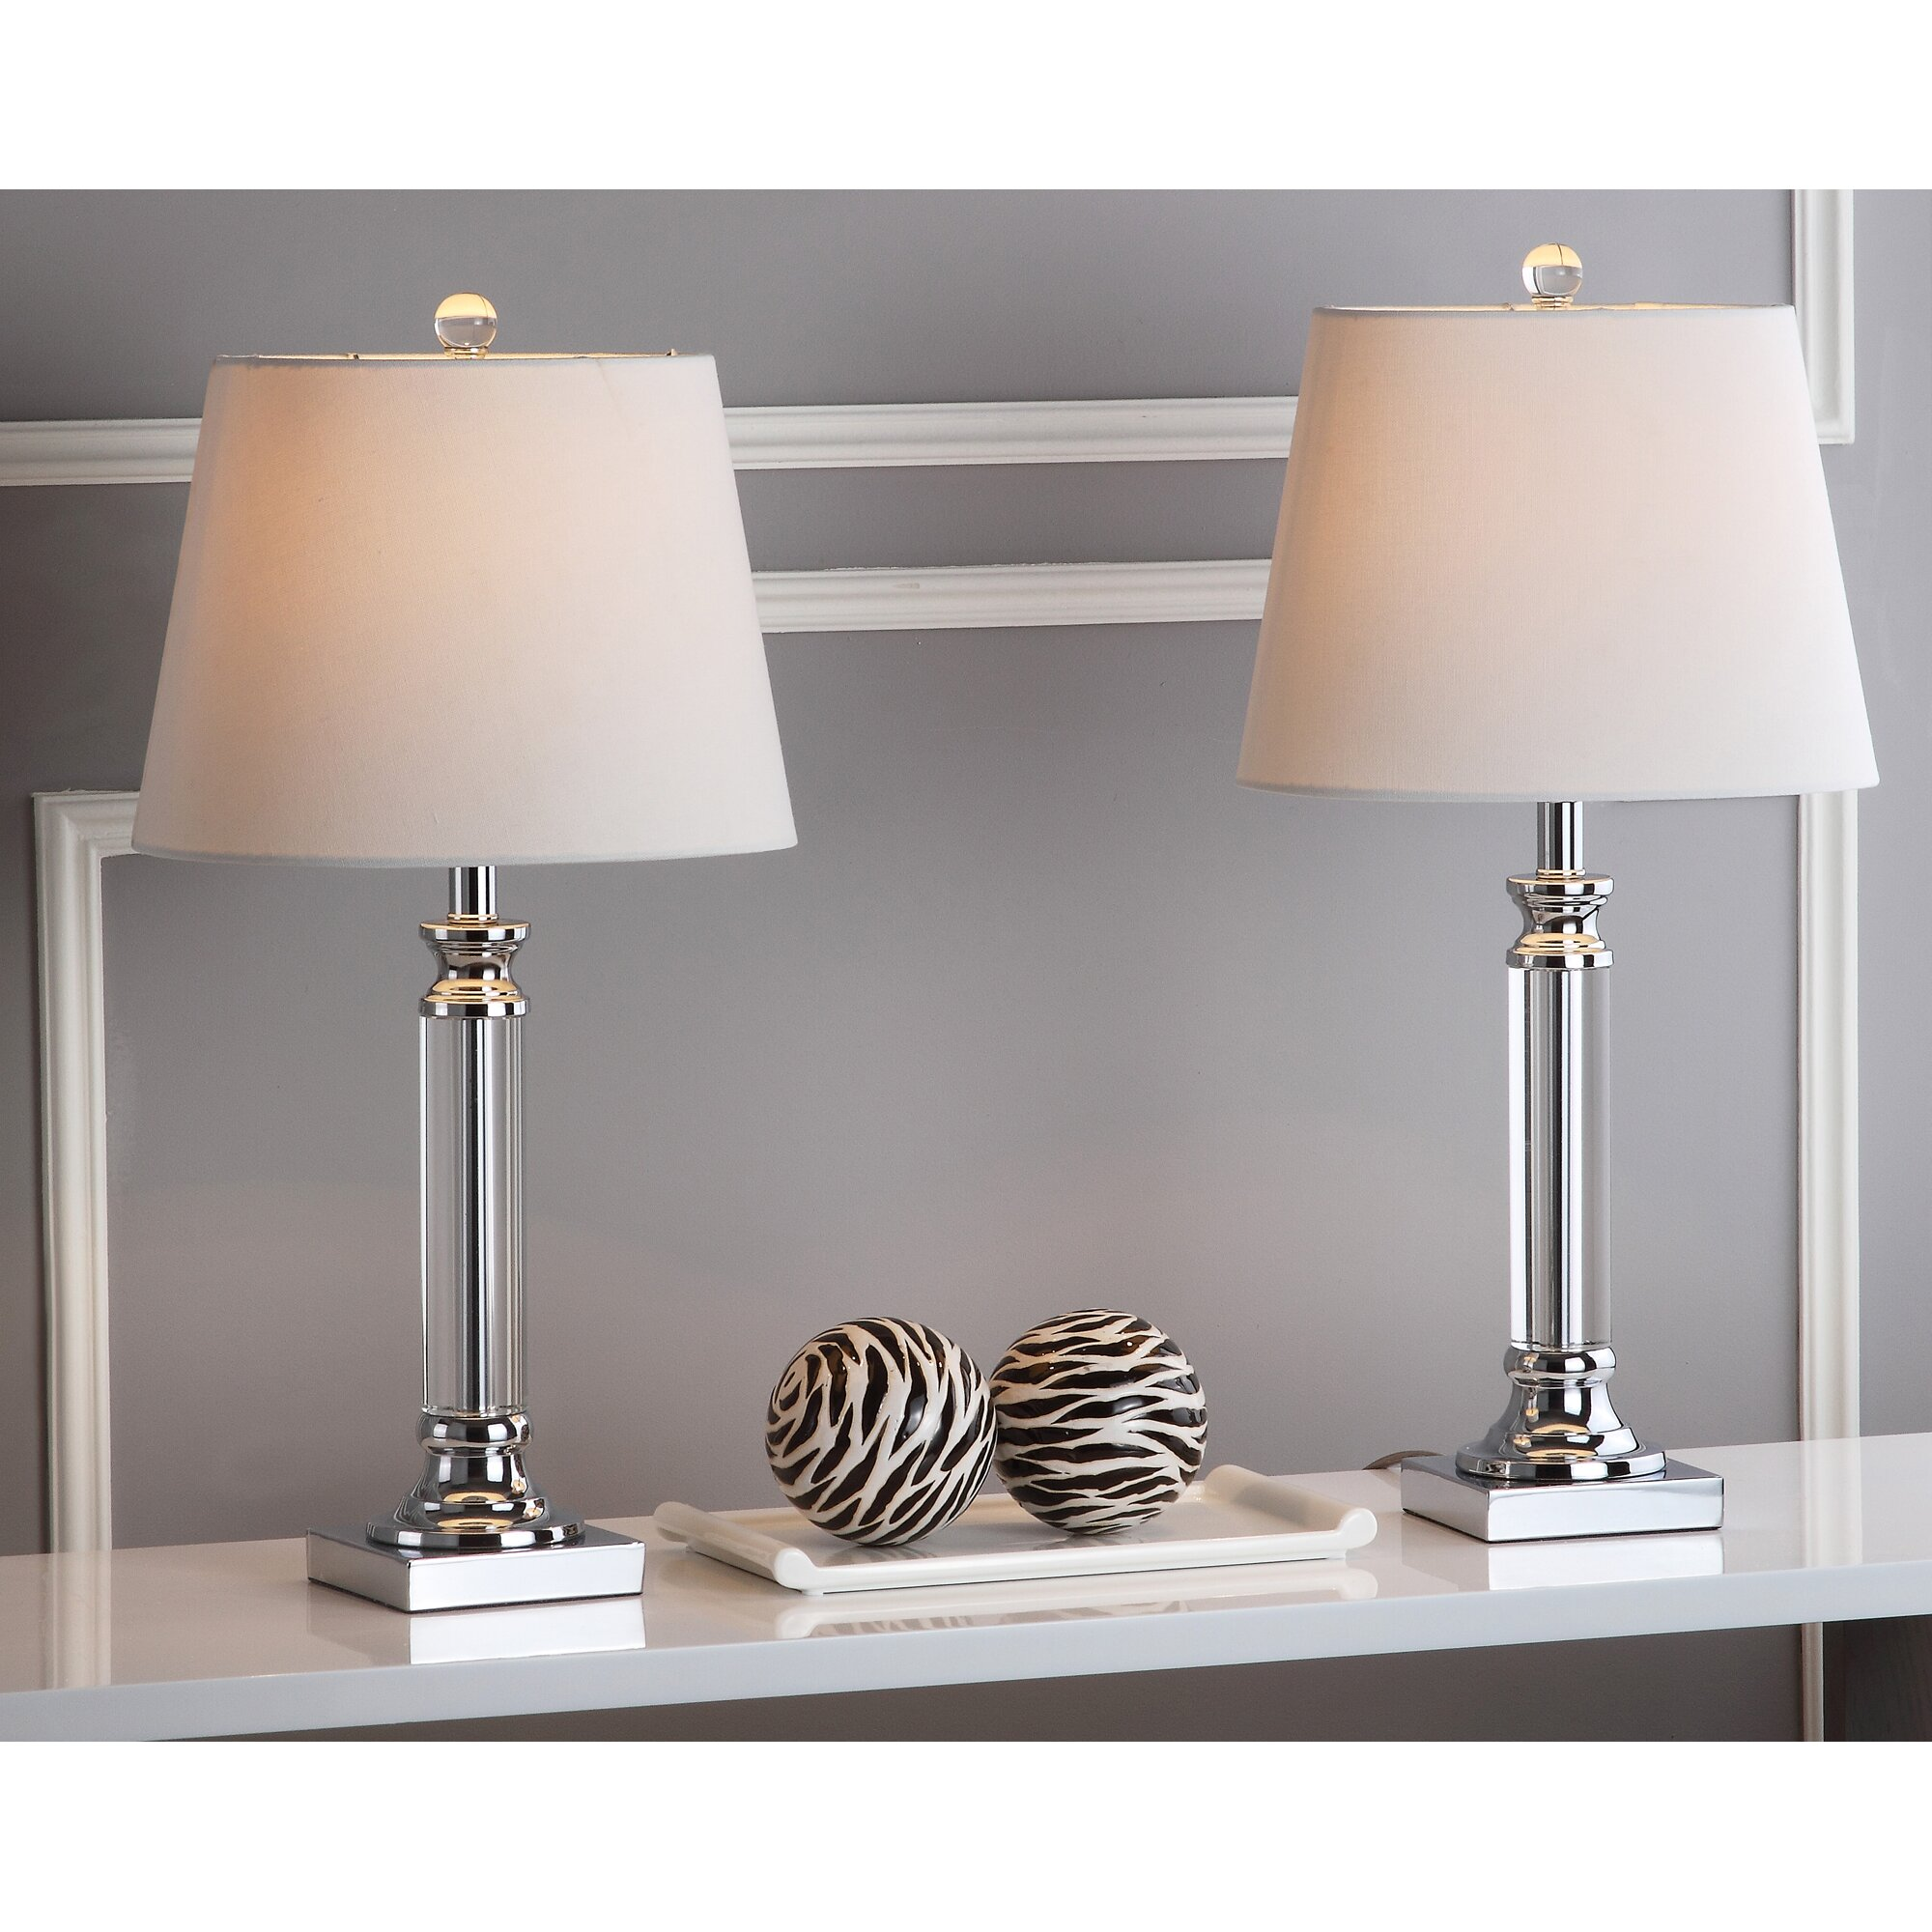 safavieh zara 23 5 table lamp reviews. Black Bedroom Furniture Sets. Home Design Ideas